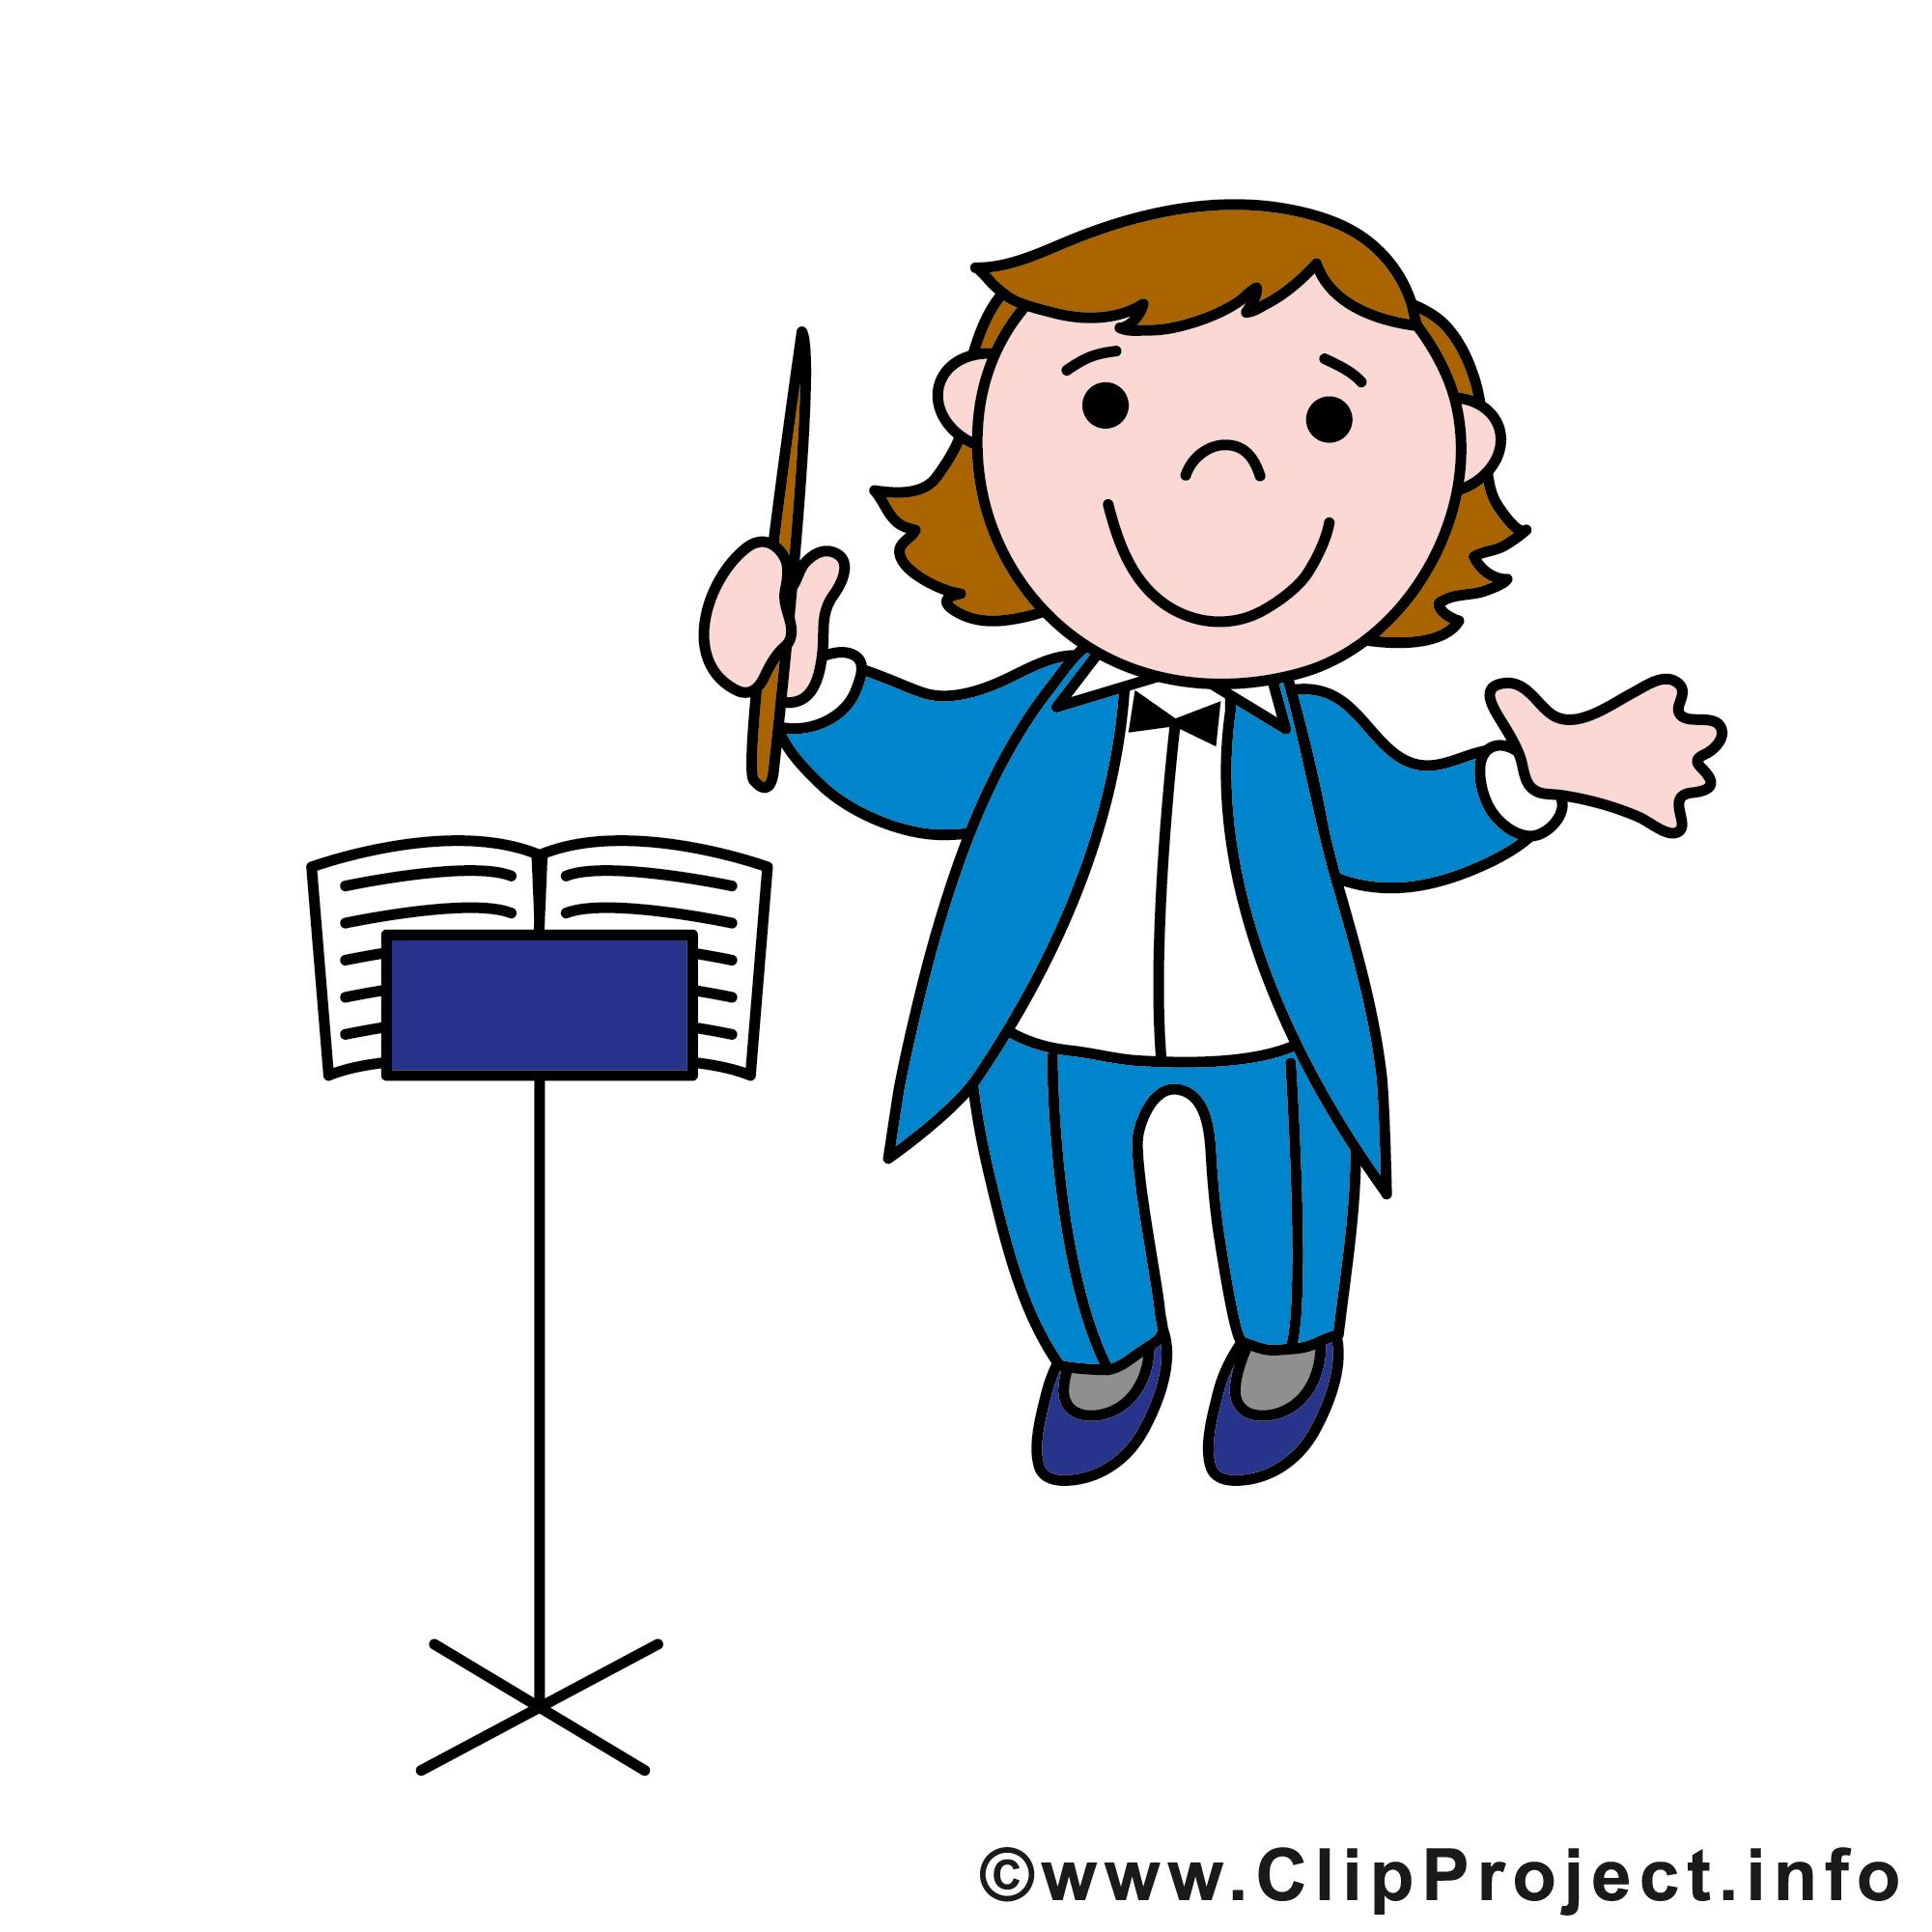 Berufe bilder clipart freeuse download Berufe Bilder, Cliparts, Cartoons, Grafiken, Illustrationen, Gifs ... freeuse download